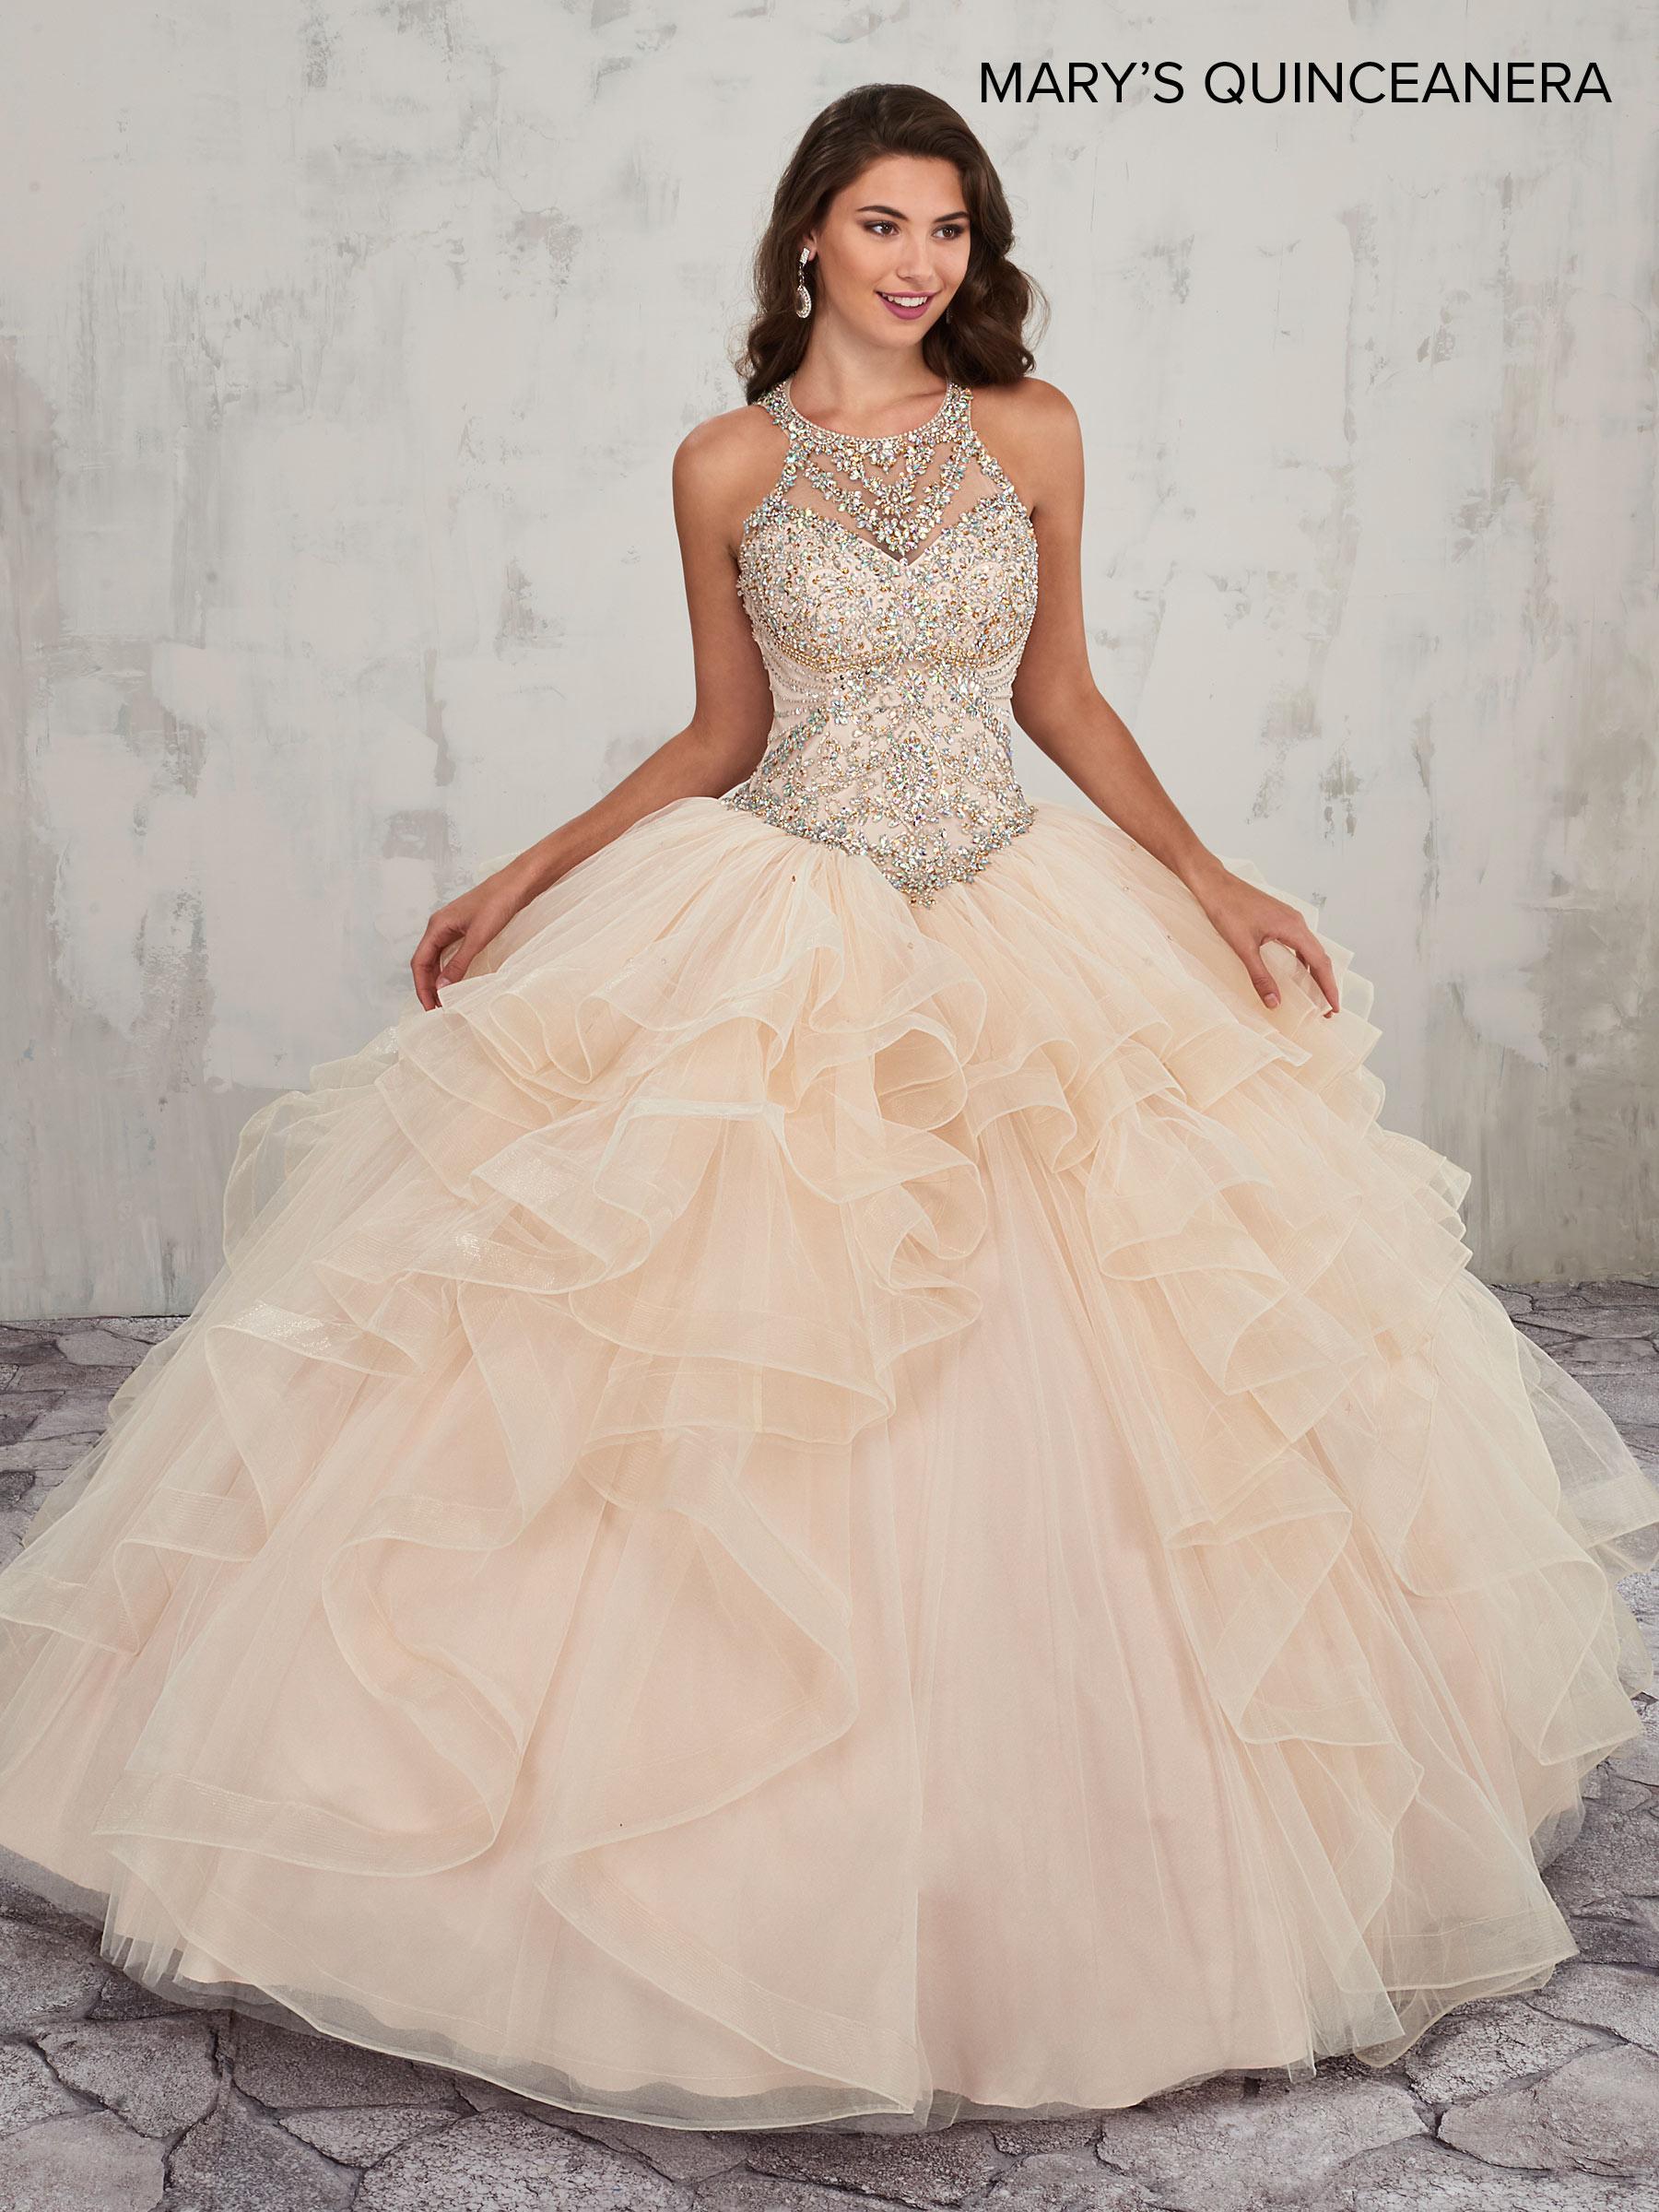 elegant mexican dresses photo - 1